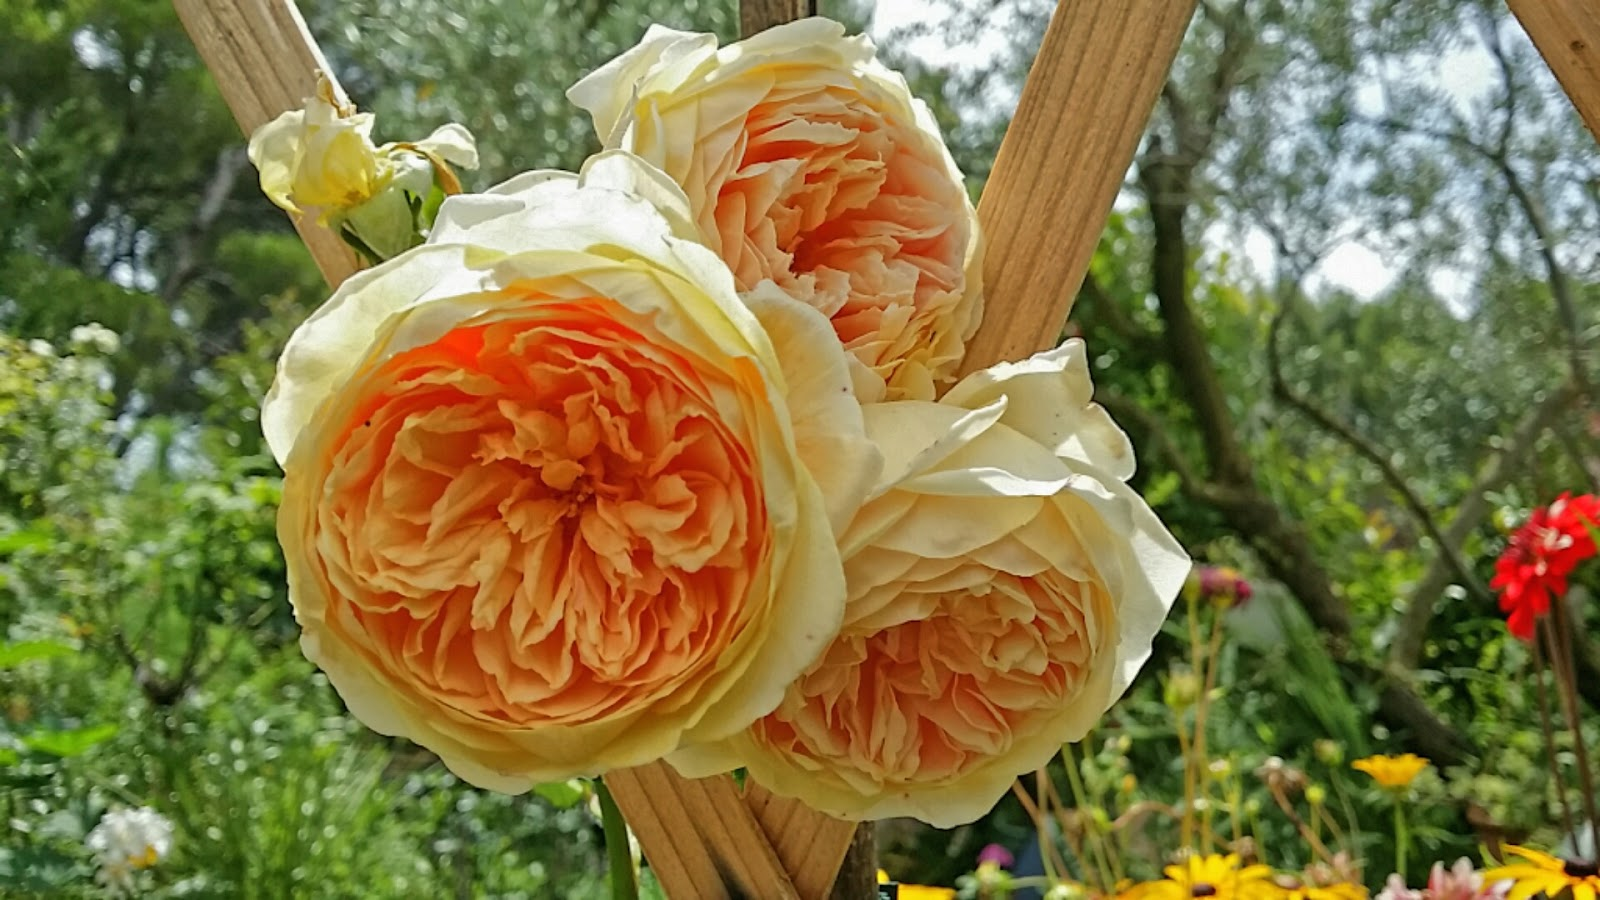 rosier dans mon jardin